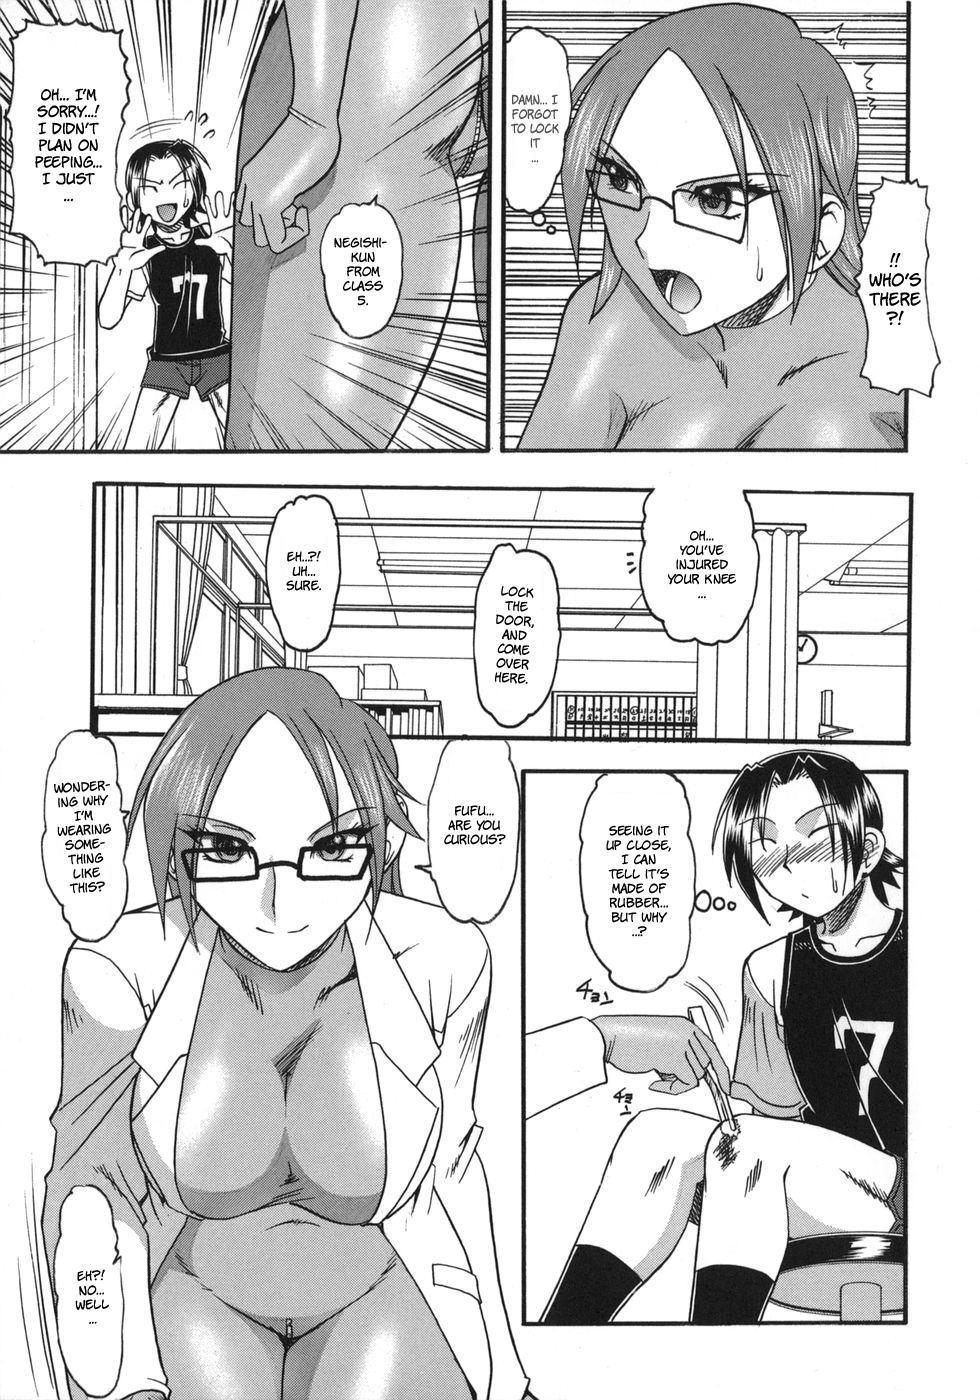 Hadaka Yori Hiwai - She is dirtier than nakedness 40